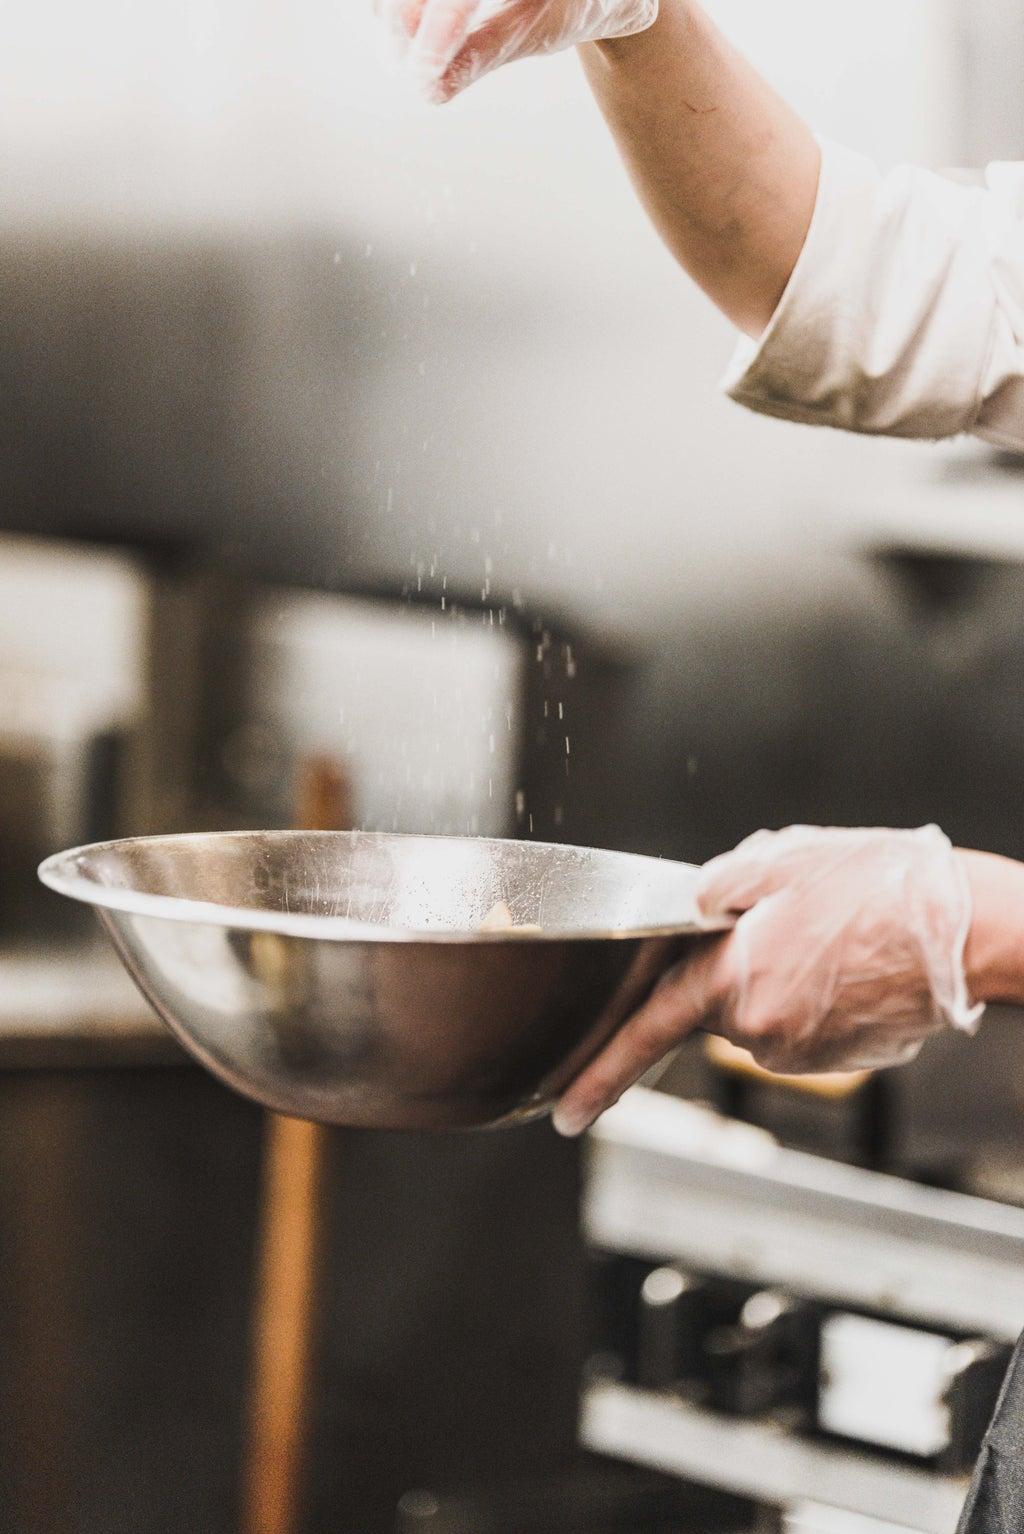 Chef pouring salt into a bowl